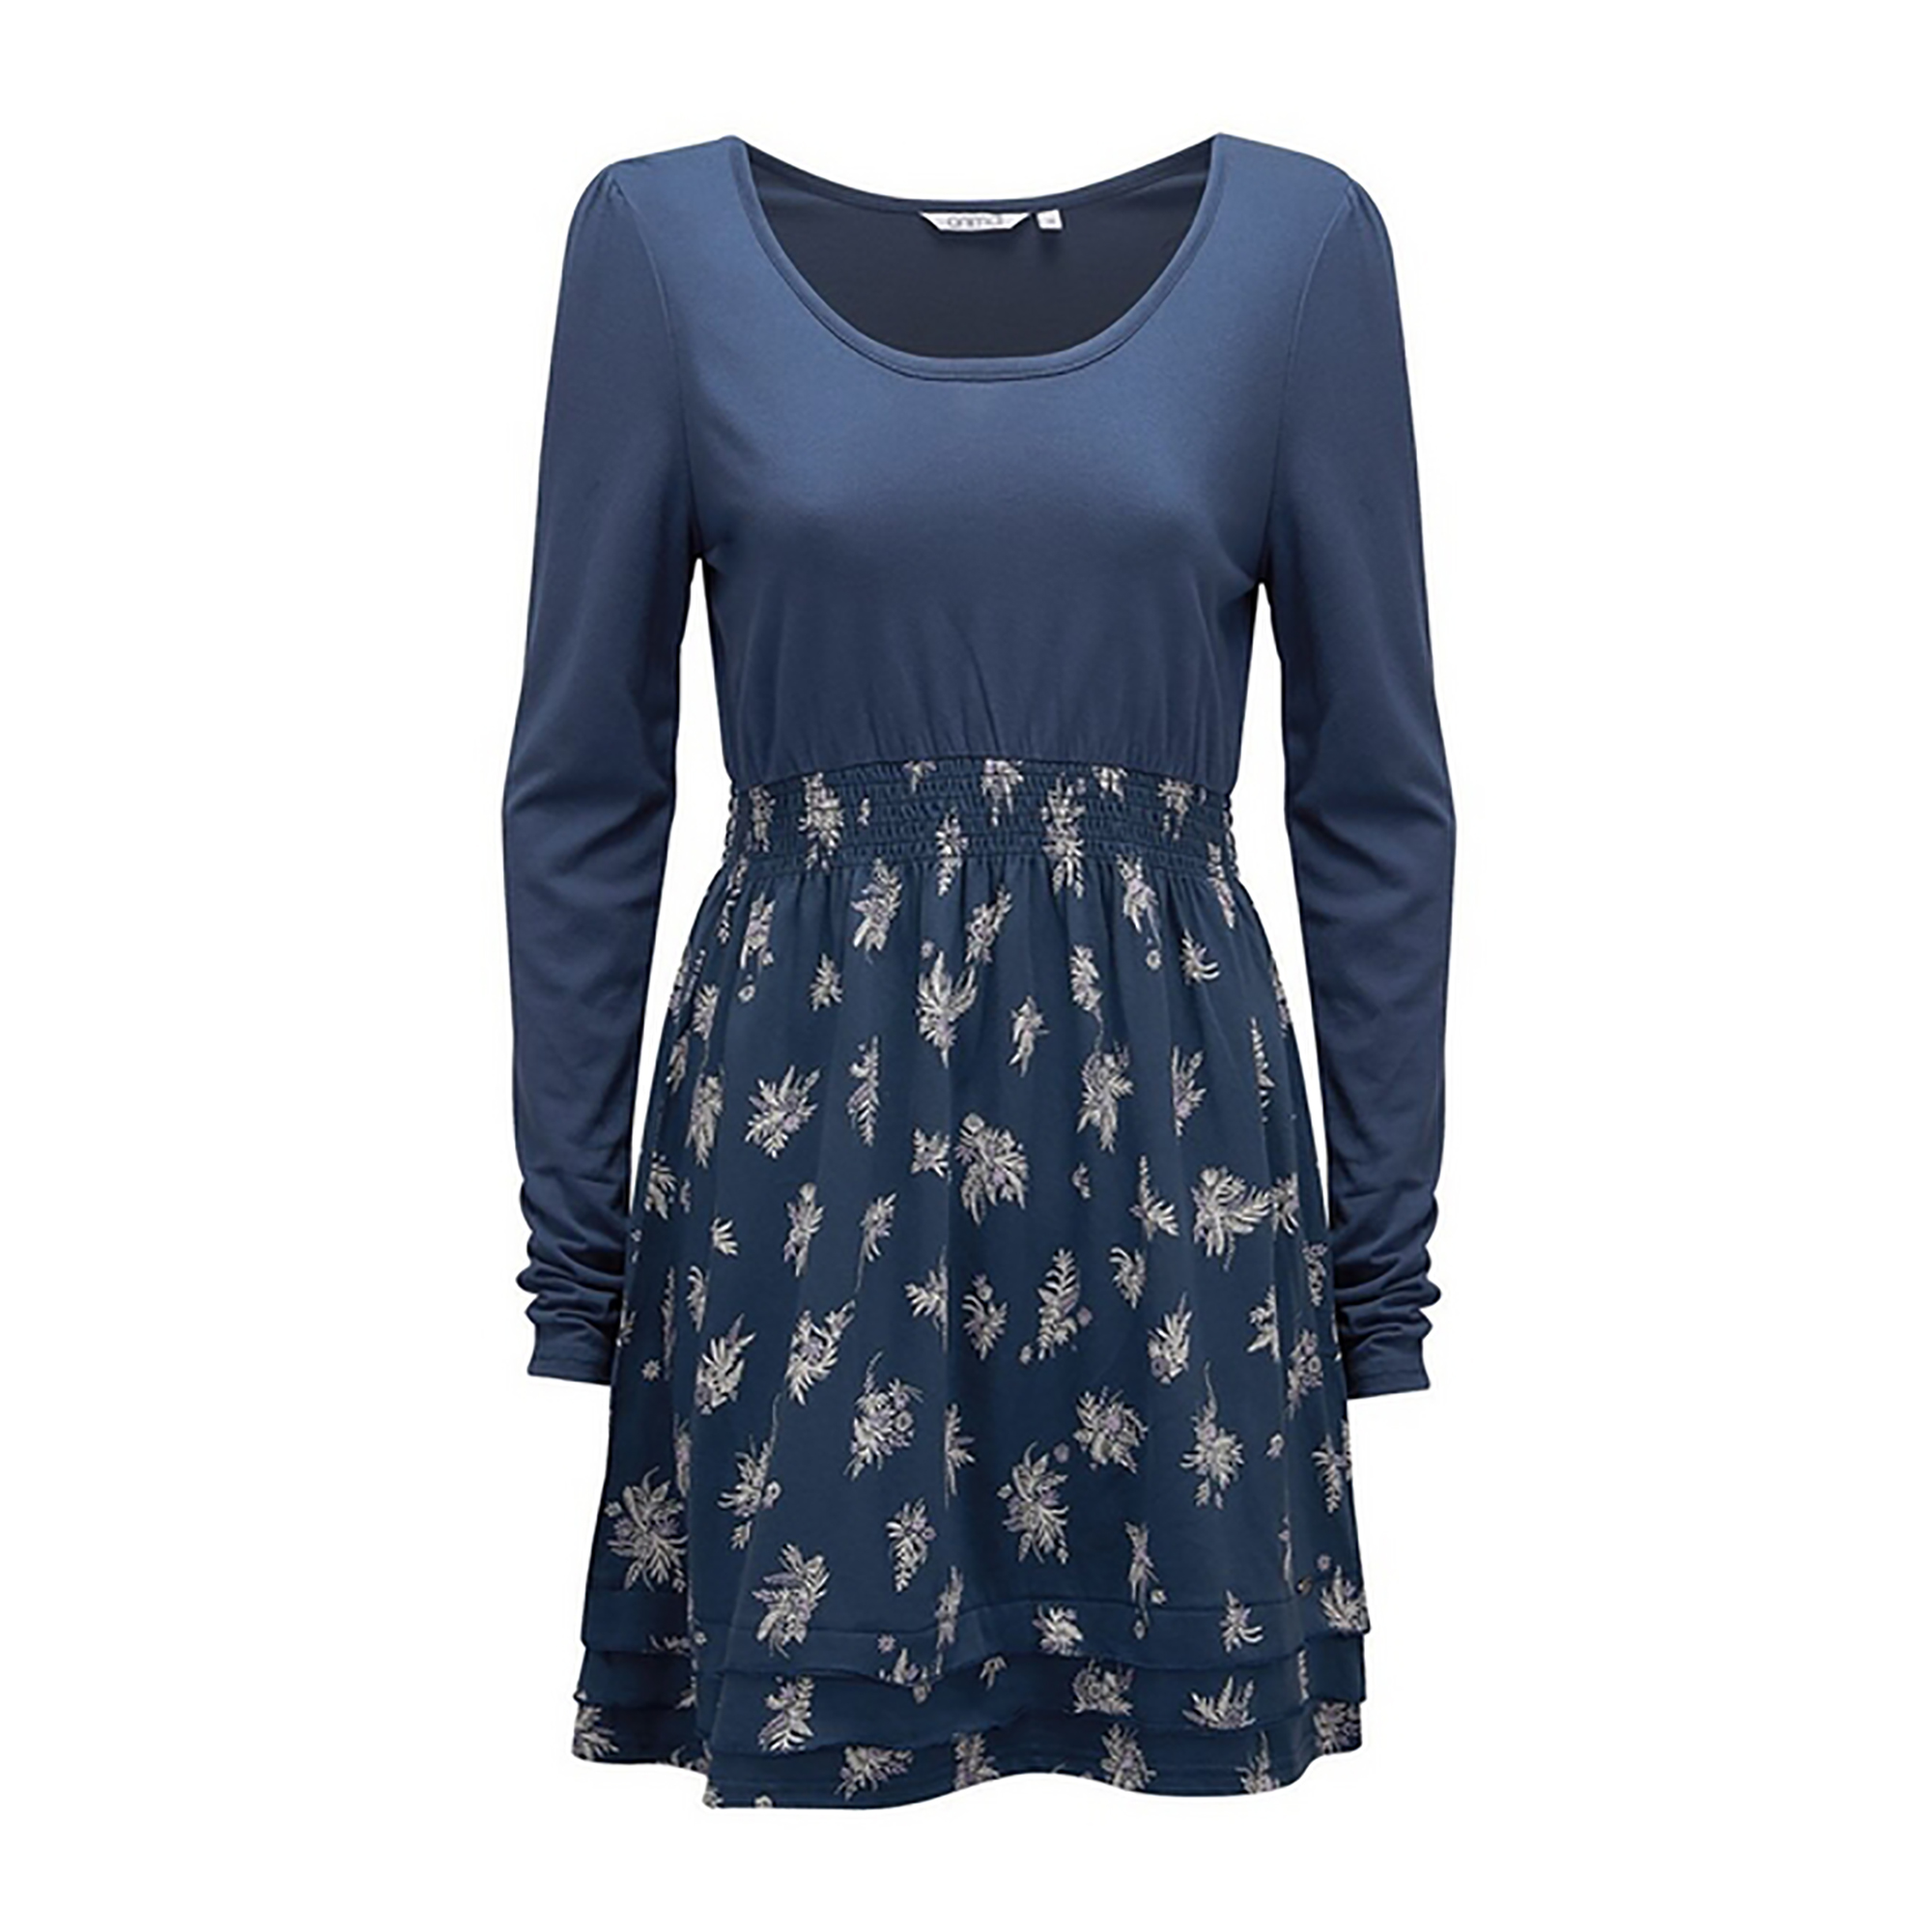 Animal-Vestido-tejido-jersey-waves-Modelo-Freckle-mujer-senora